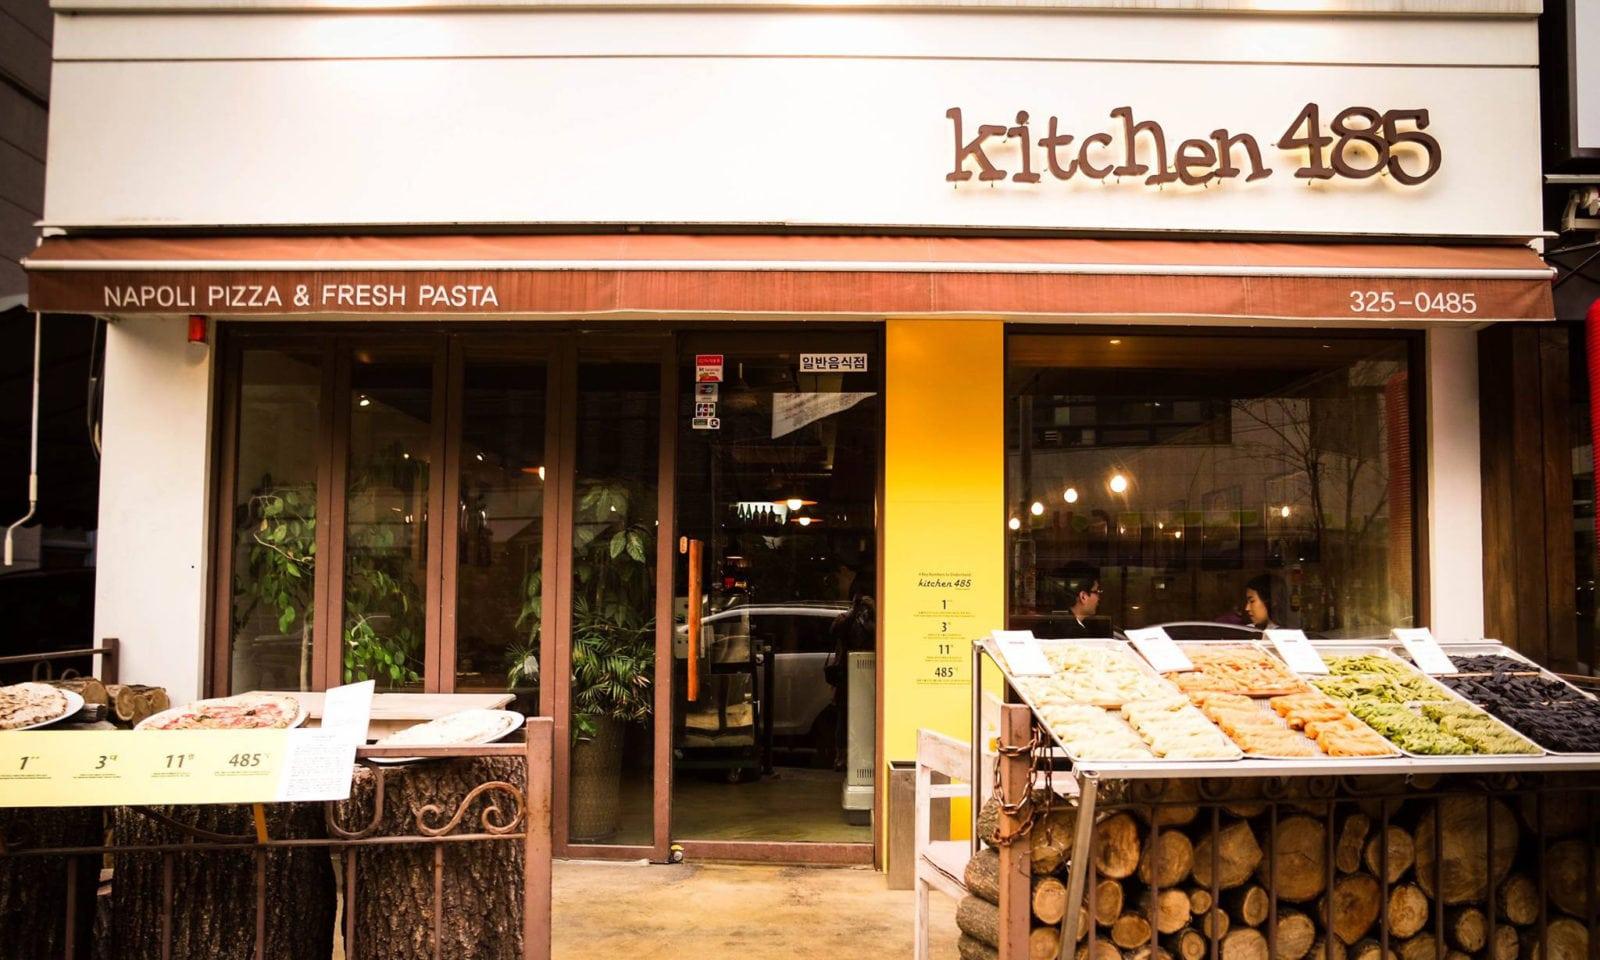 Kitchen 485 | Mapo-gu, Seoul